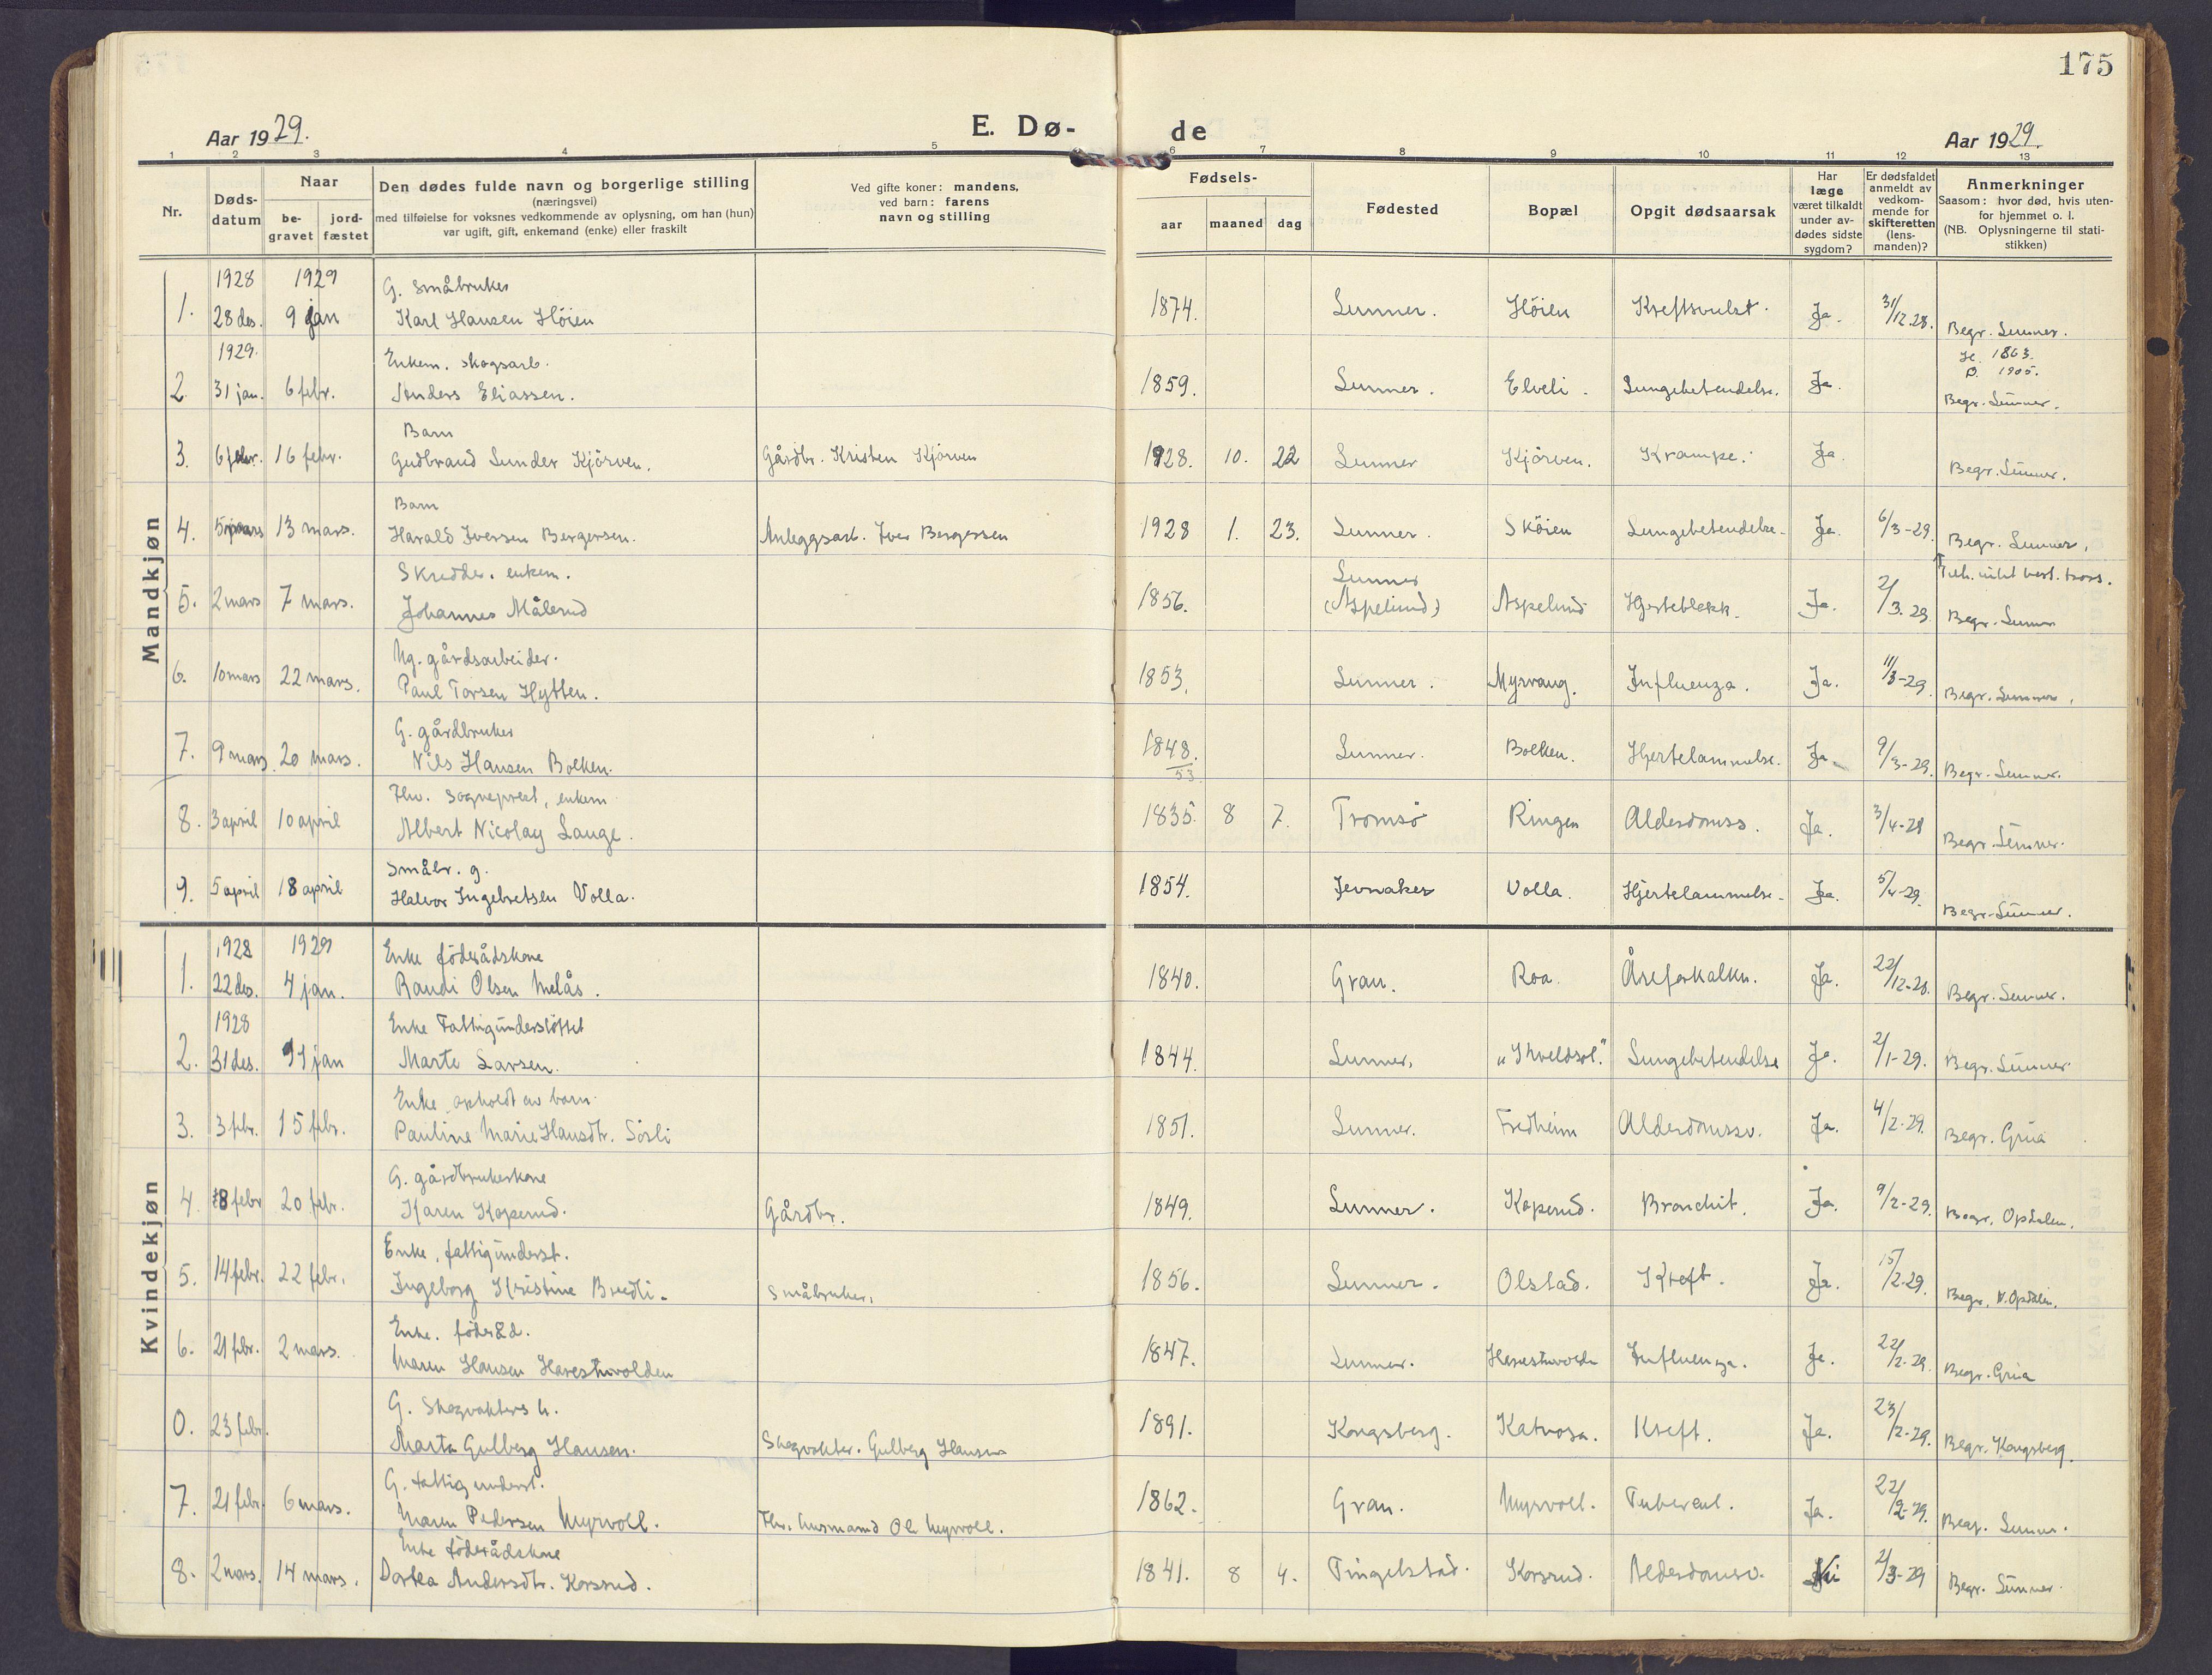 SAH, Lunner prestekontor, H/Ha/Haa/L0002: Ministerialbok nr. 2, 1922-1931, s. 175